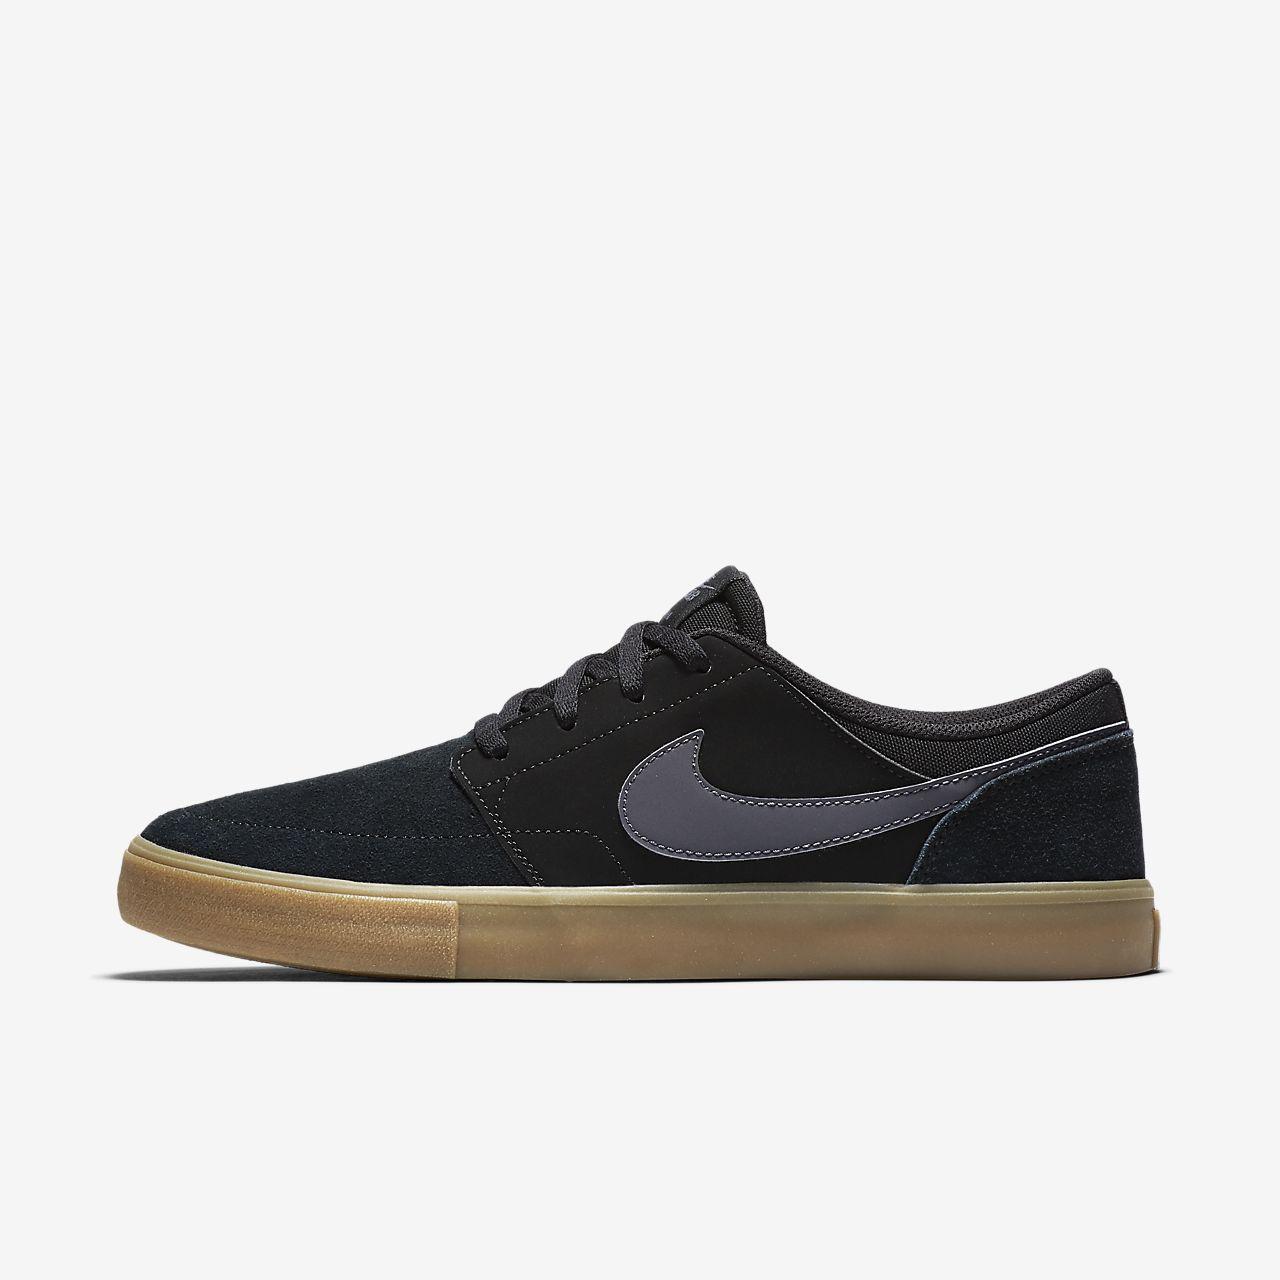 Solarsoft Portmore II Herren Skateboardschuh Nike SB shdtCQrx